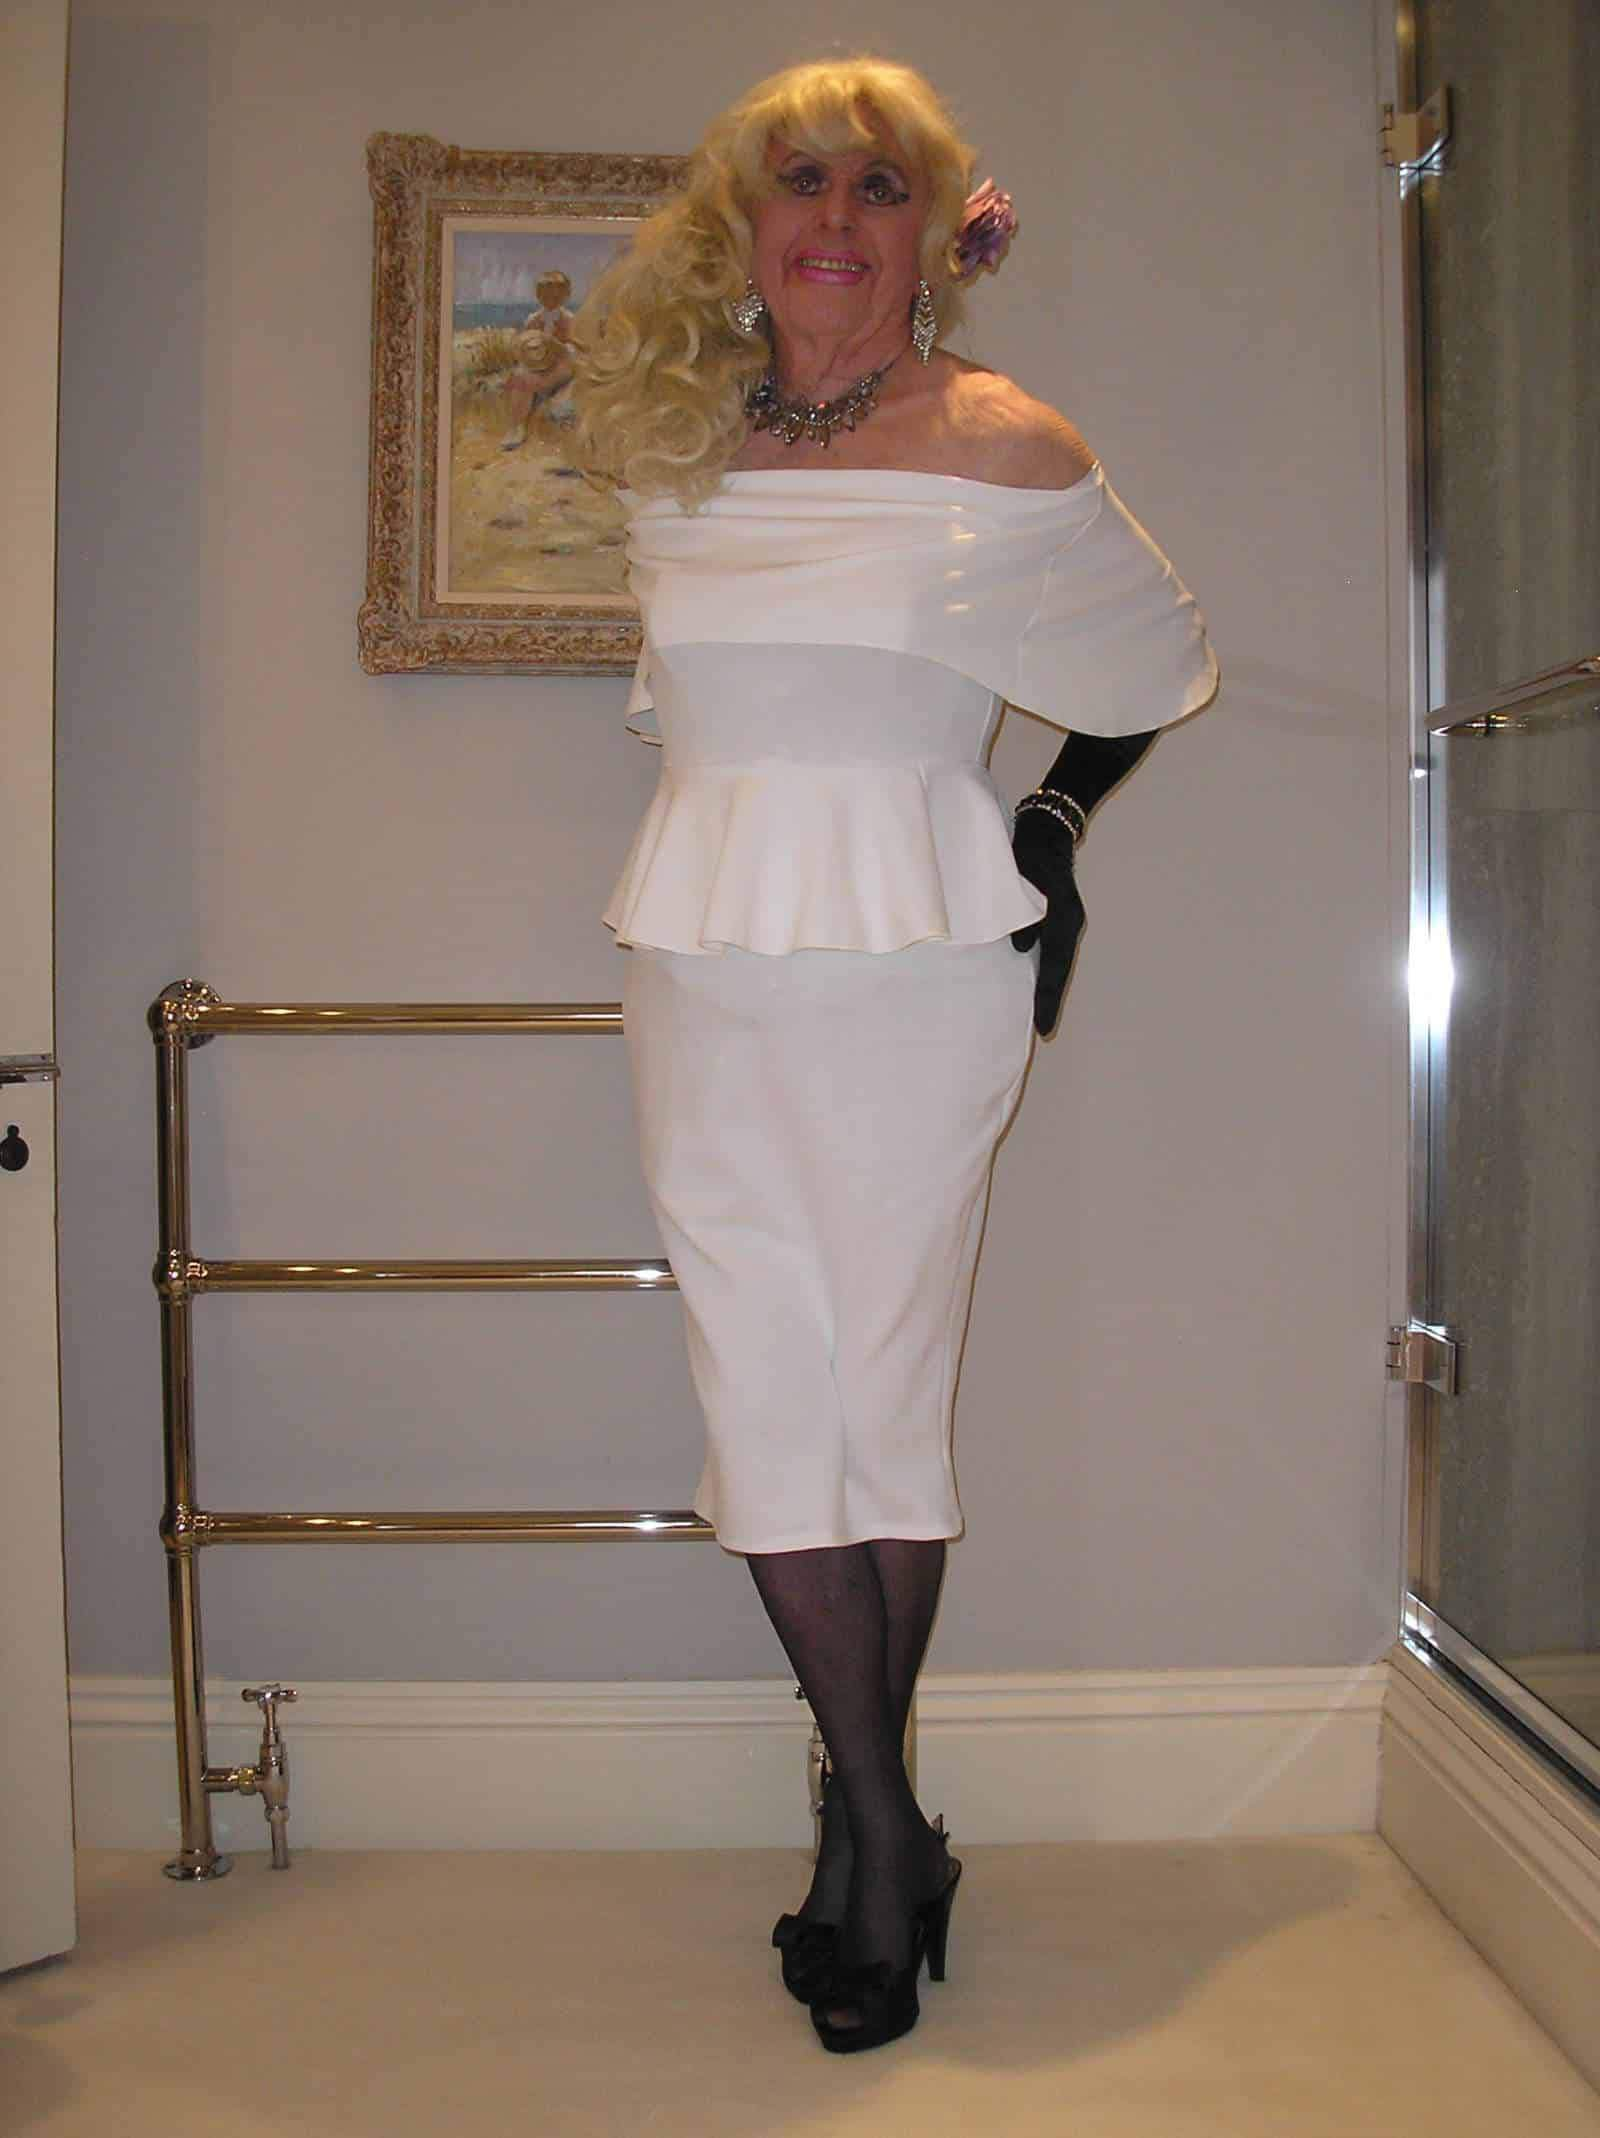 My Favourite Party Dress Crossdress Heaven Photos